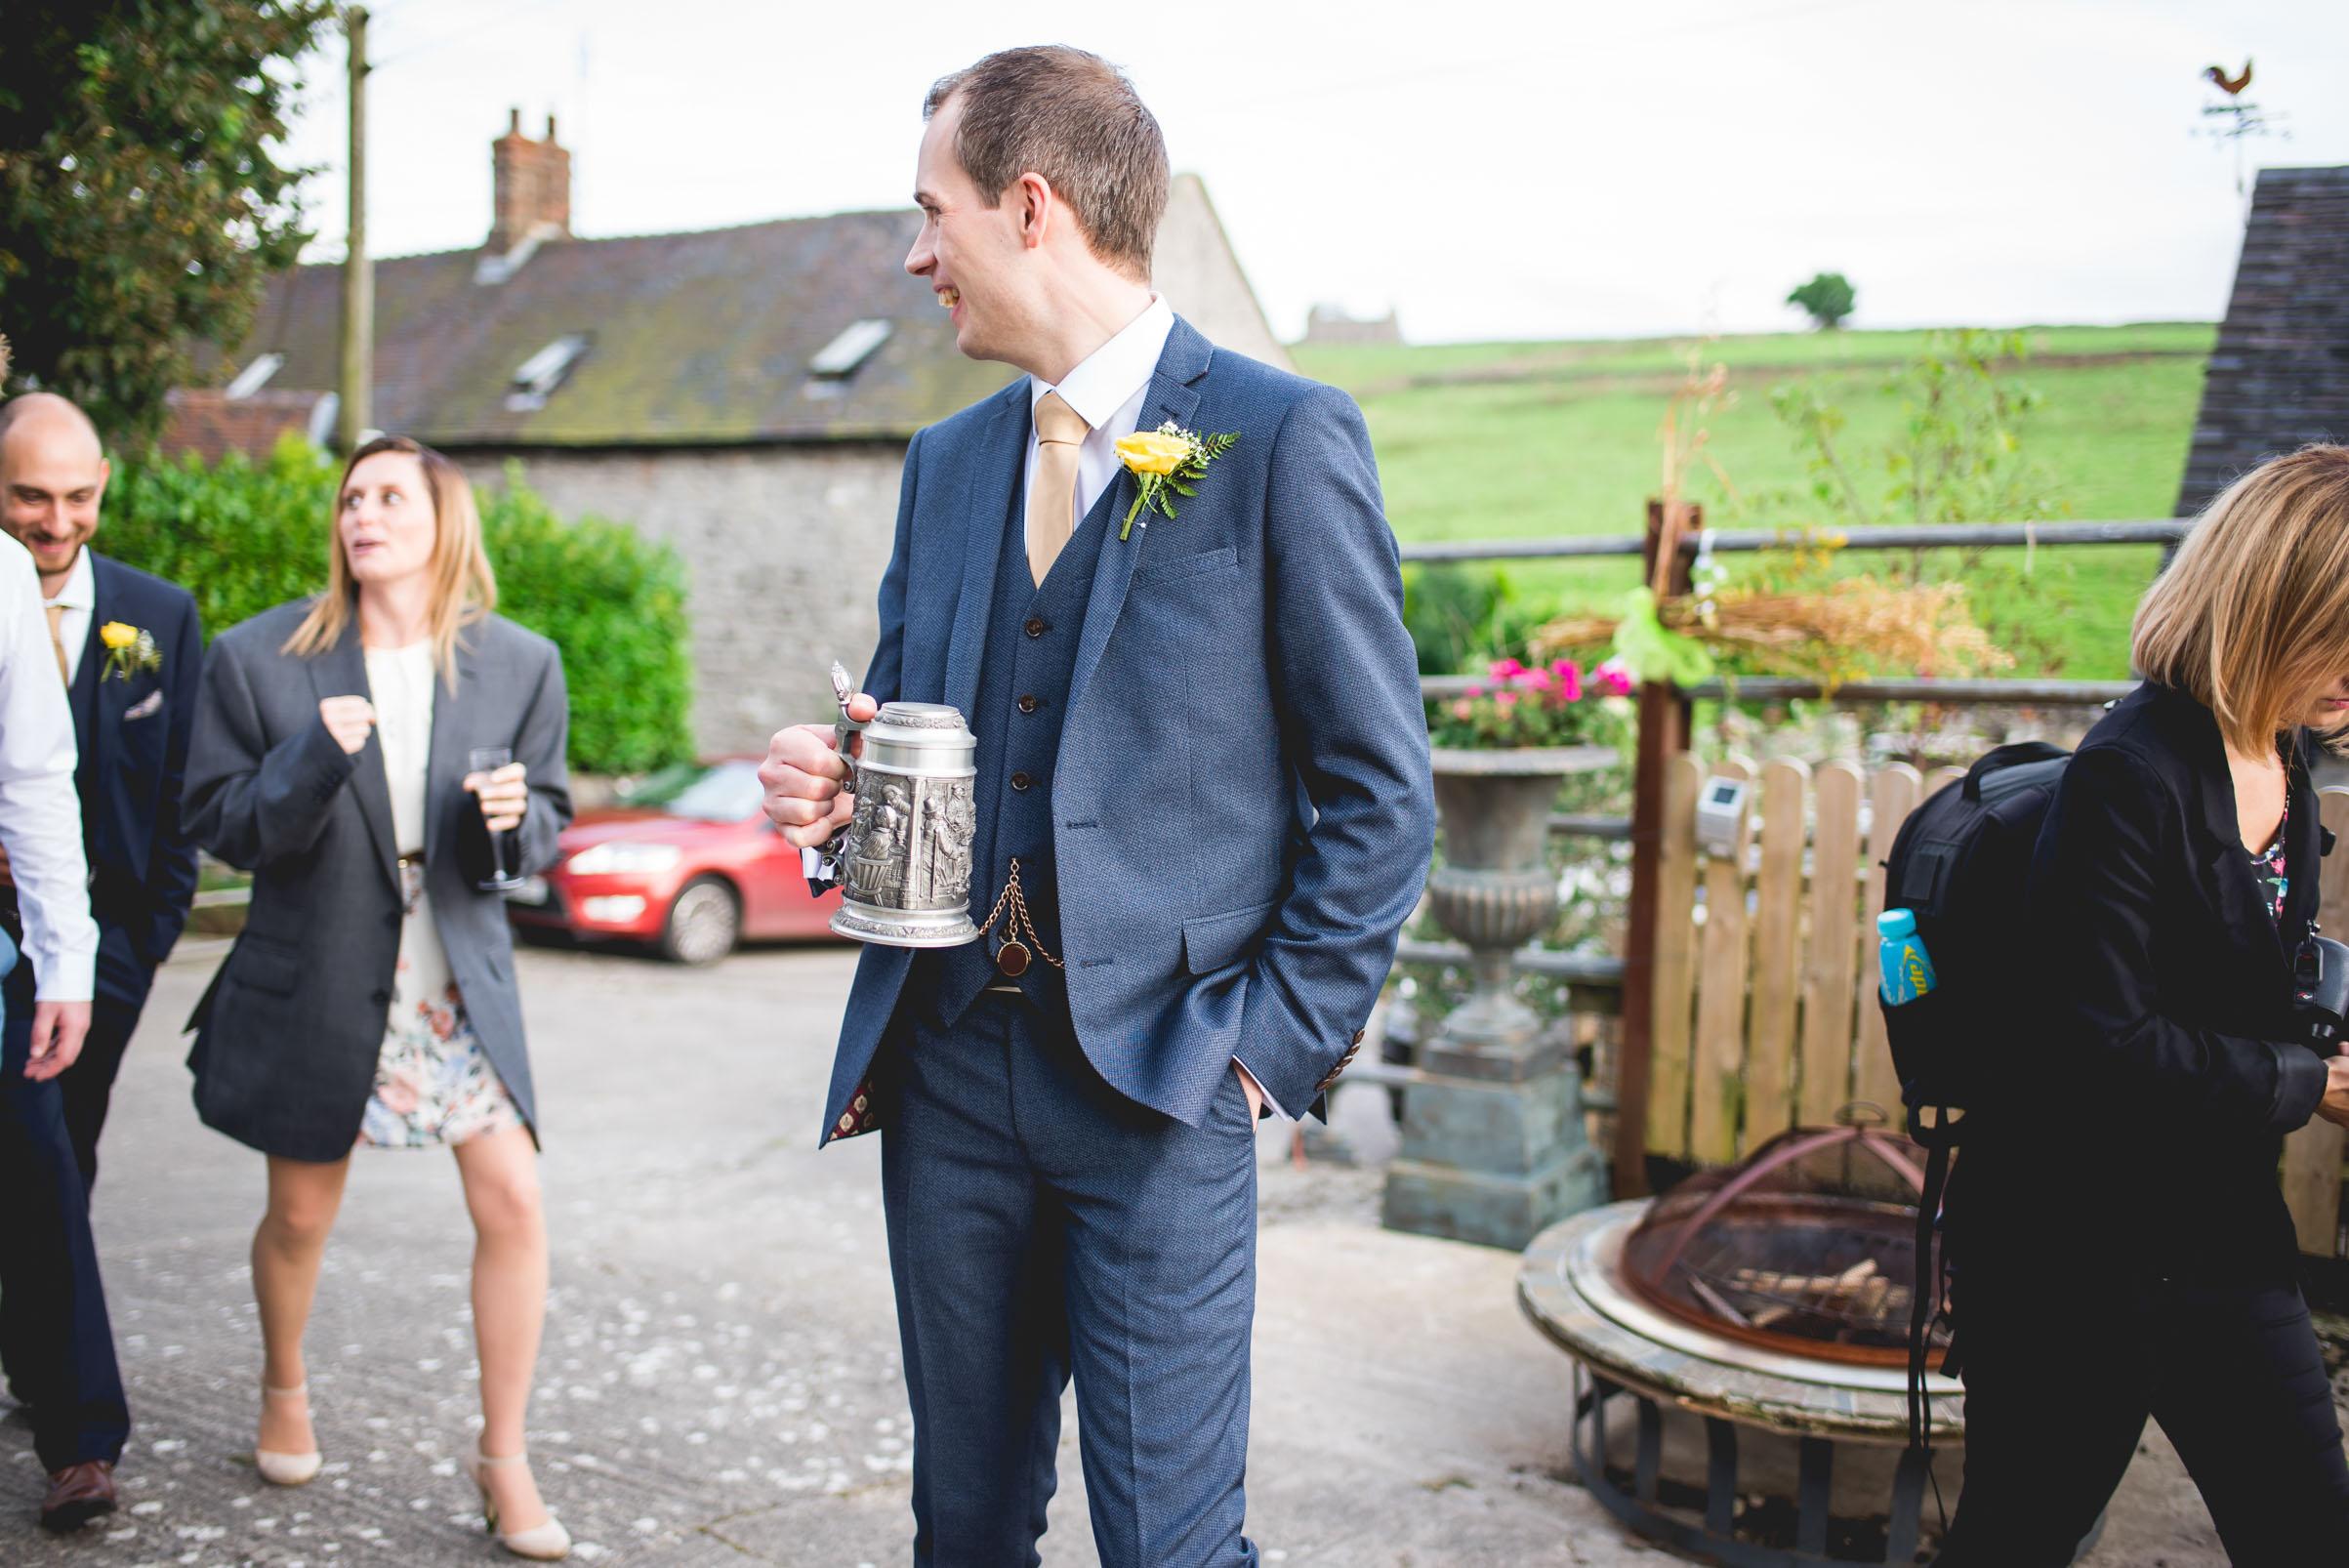 Peak+district+farm+wedding+lower+damgate+photographer-176.jpg